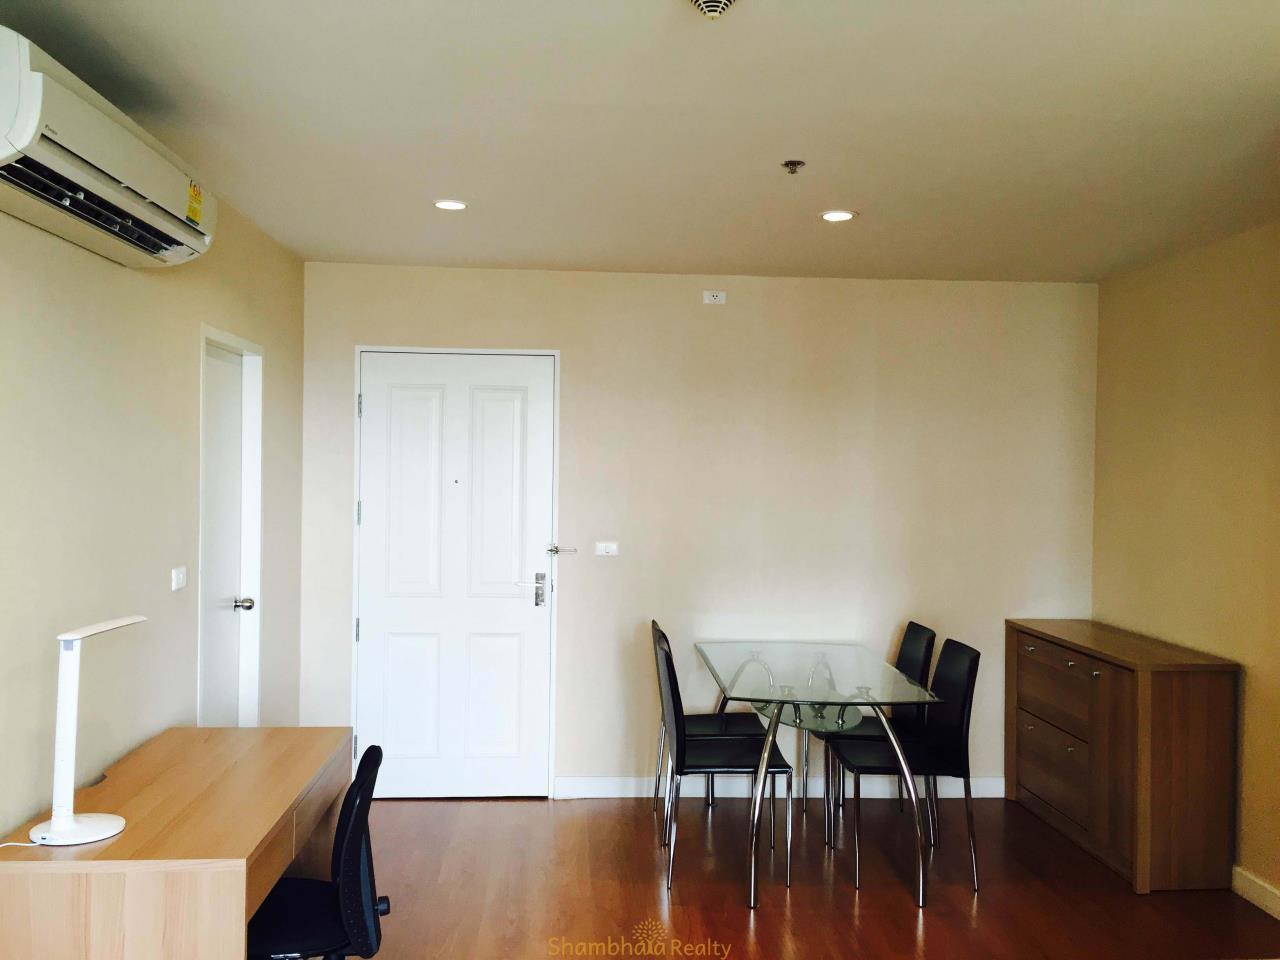 Shambhala Realty Agency's Condo One X Sukhumvit 26 Condominium for Rent in Sukhumvit 26 5